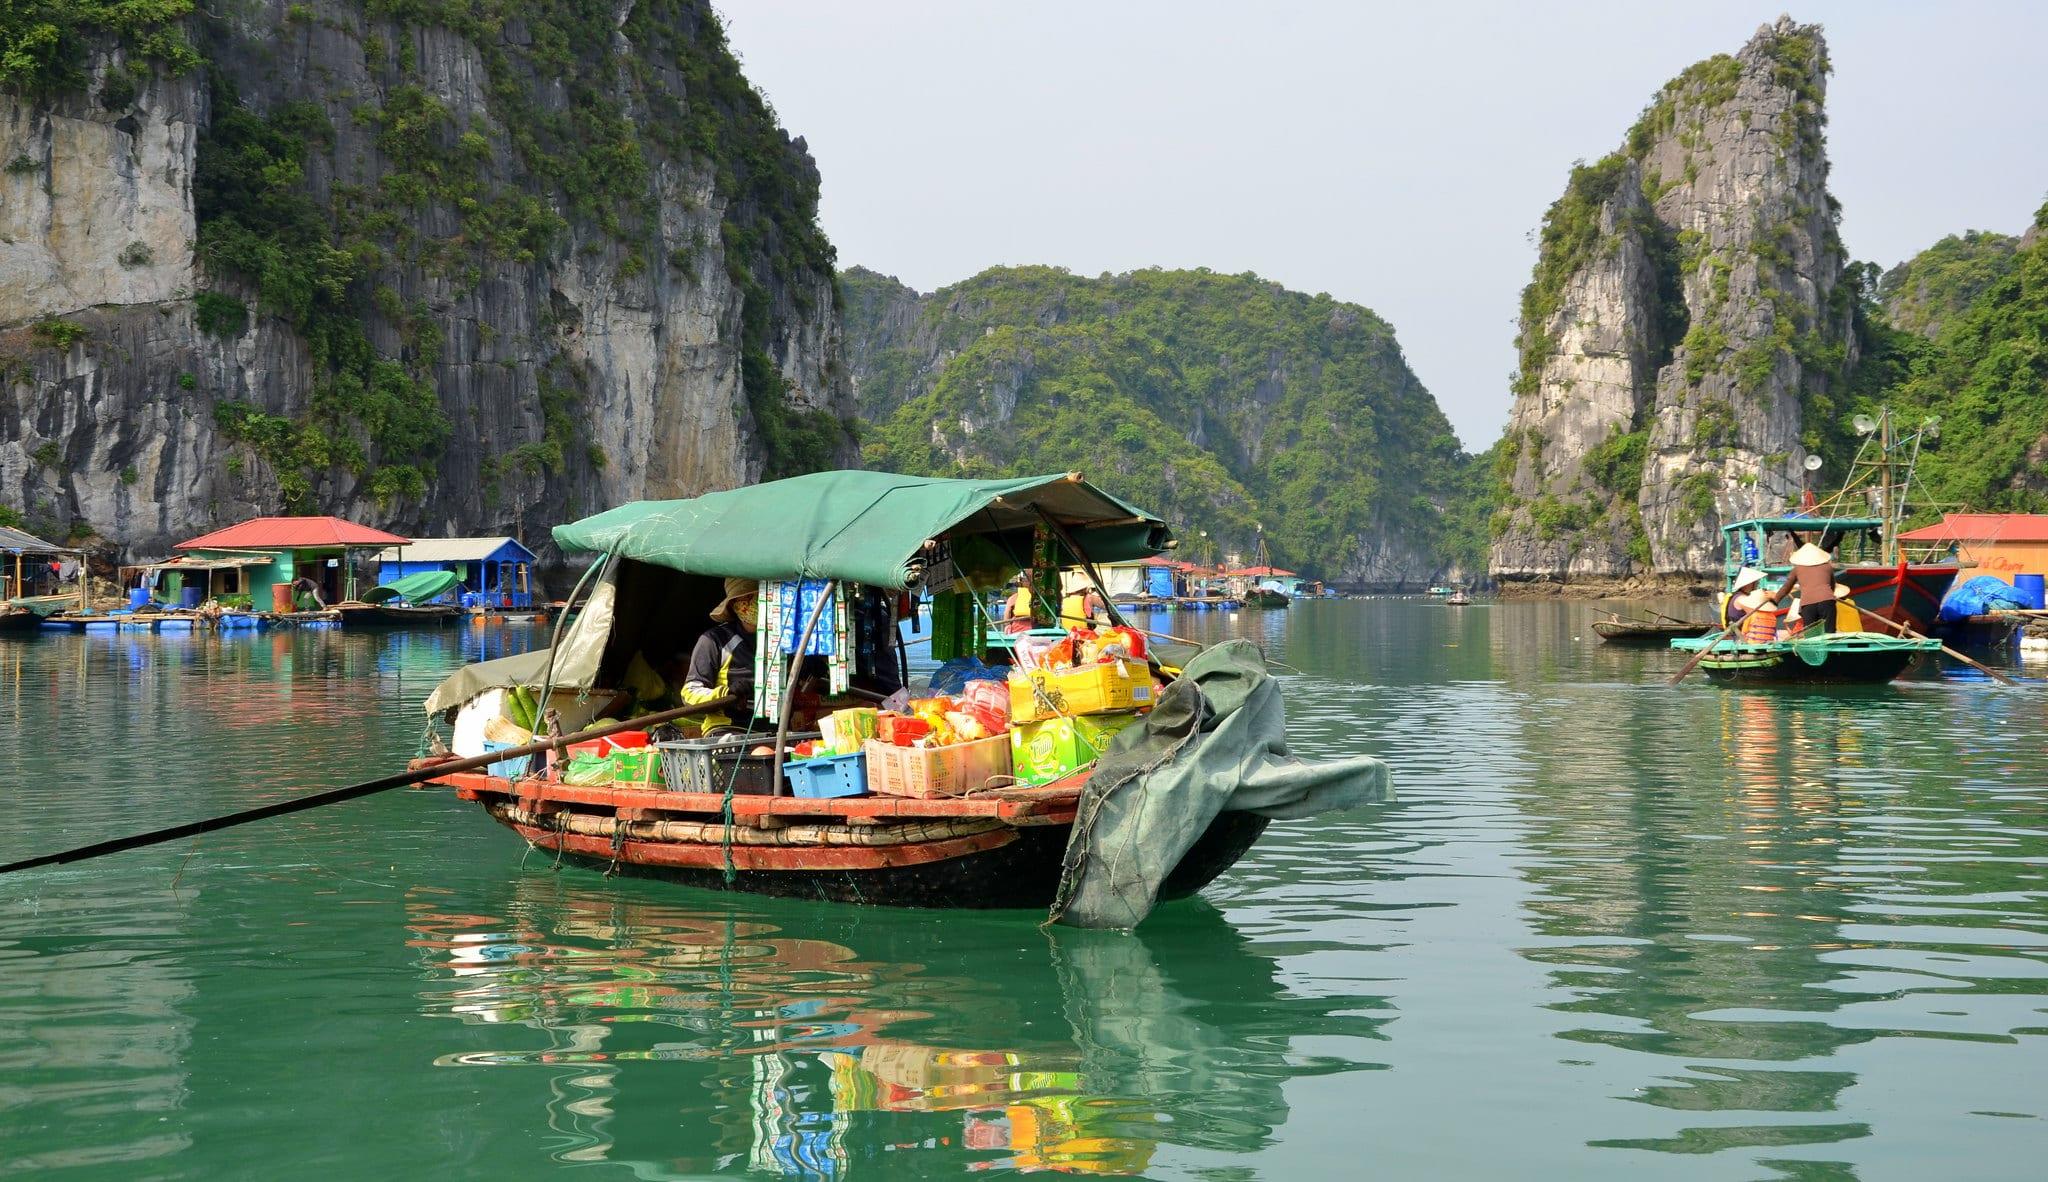 Image of the Vung Vieng floating village in Bai Tu Long Bay, Vietnam